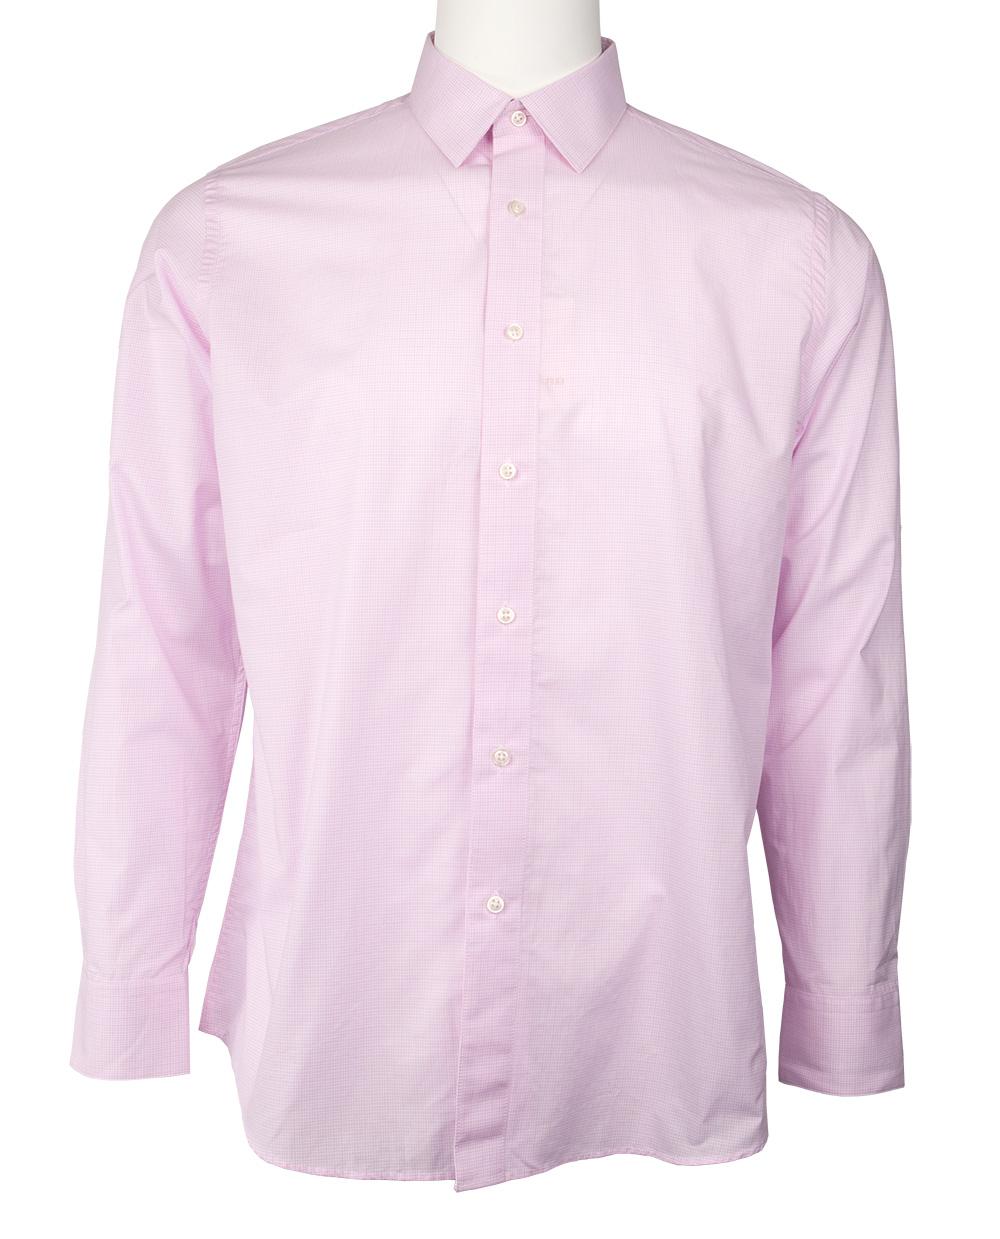 17173 - Pink